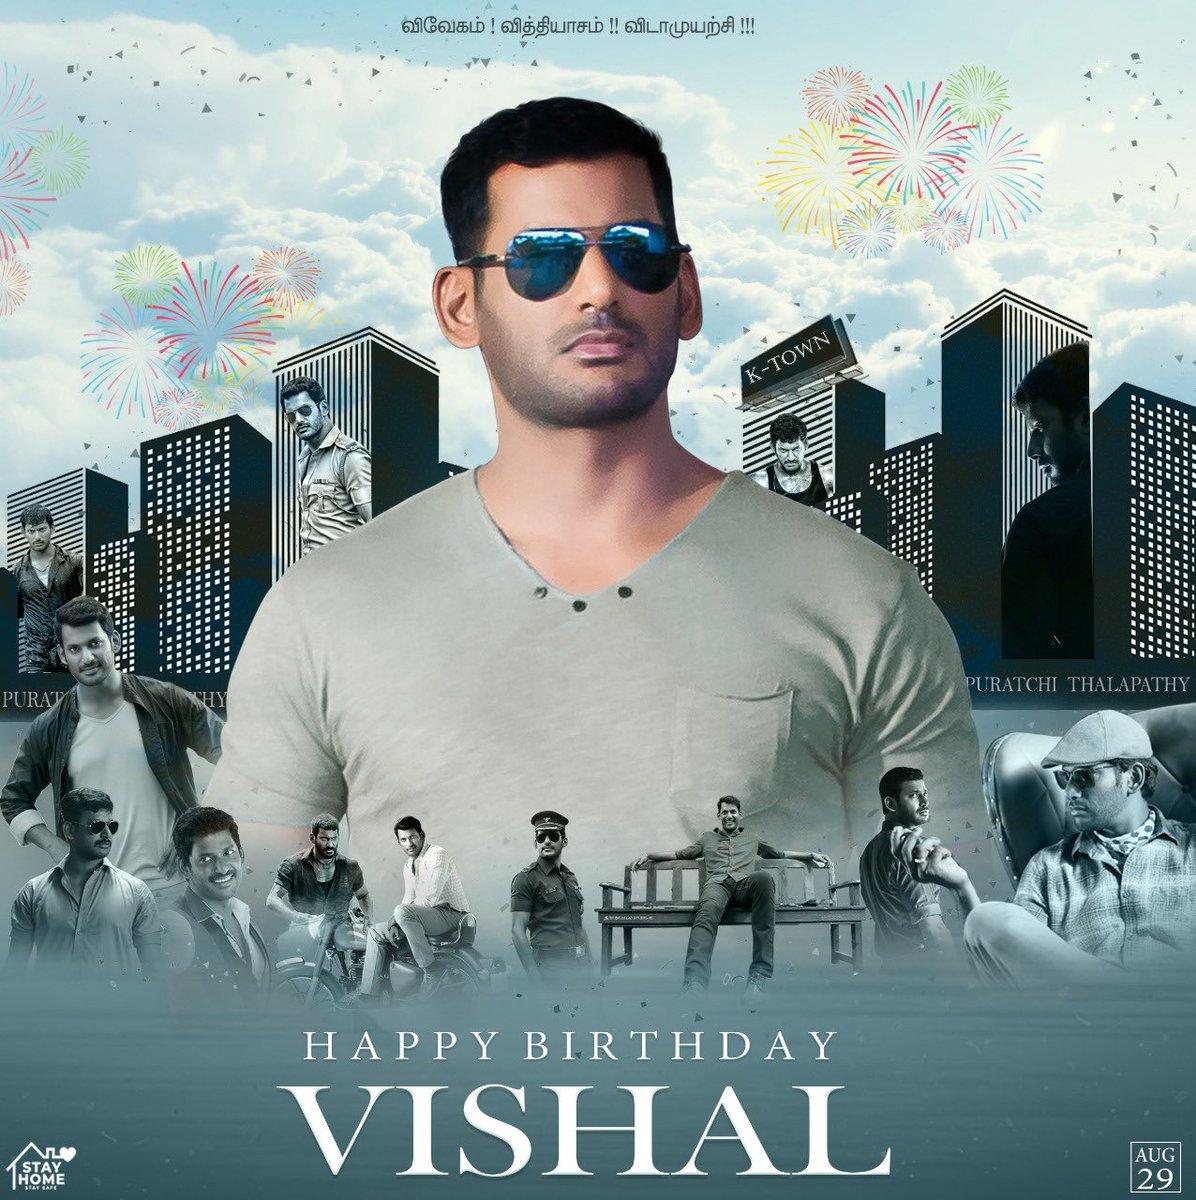 Happpyy birrrthday star! 🤗  Happy to release the CDP for @VishalKOfficial's Birthday!  Happy birthday #Vishal!   #HBDVishal #HappyBirthdayVishal  #VishalBdayCDP   @HariKr_official @VffVishal @johnsoncinepro @saravanaspb @VISHAL_SFC @baraju_SuperHit https://t.co/9ReqxB1y7A